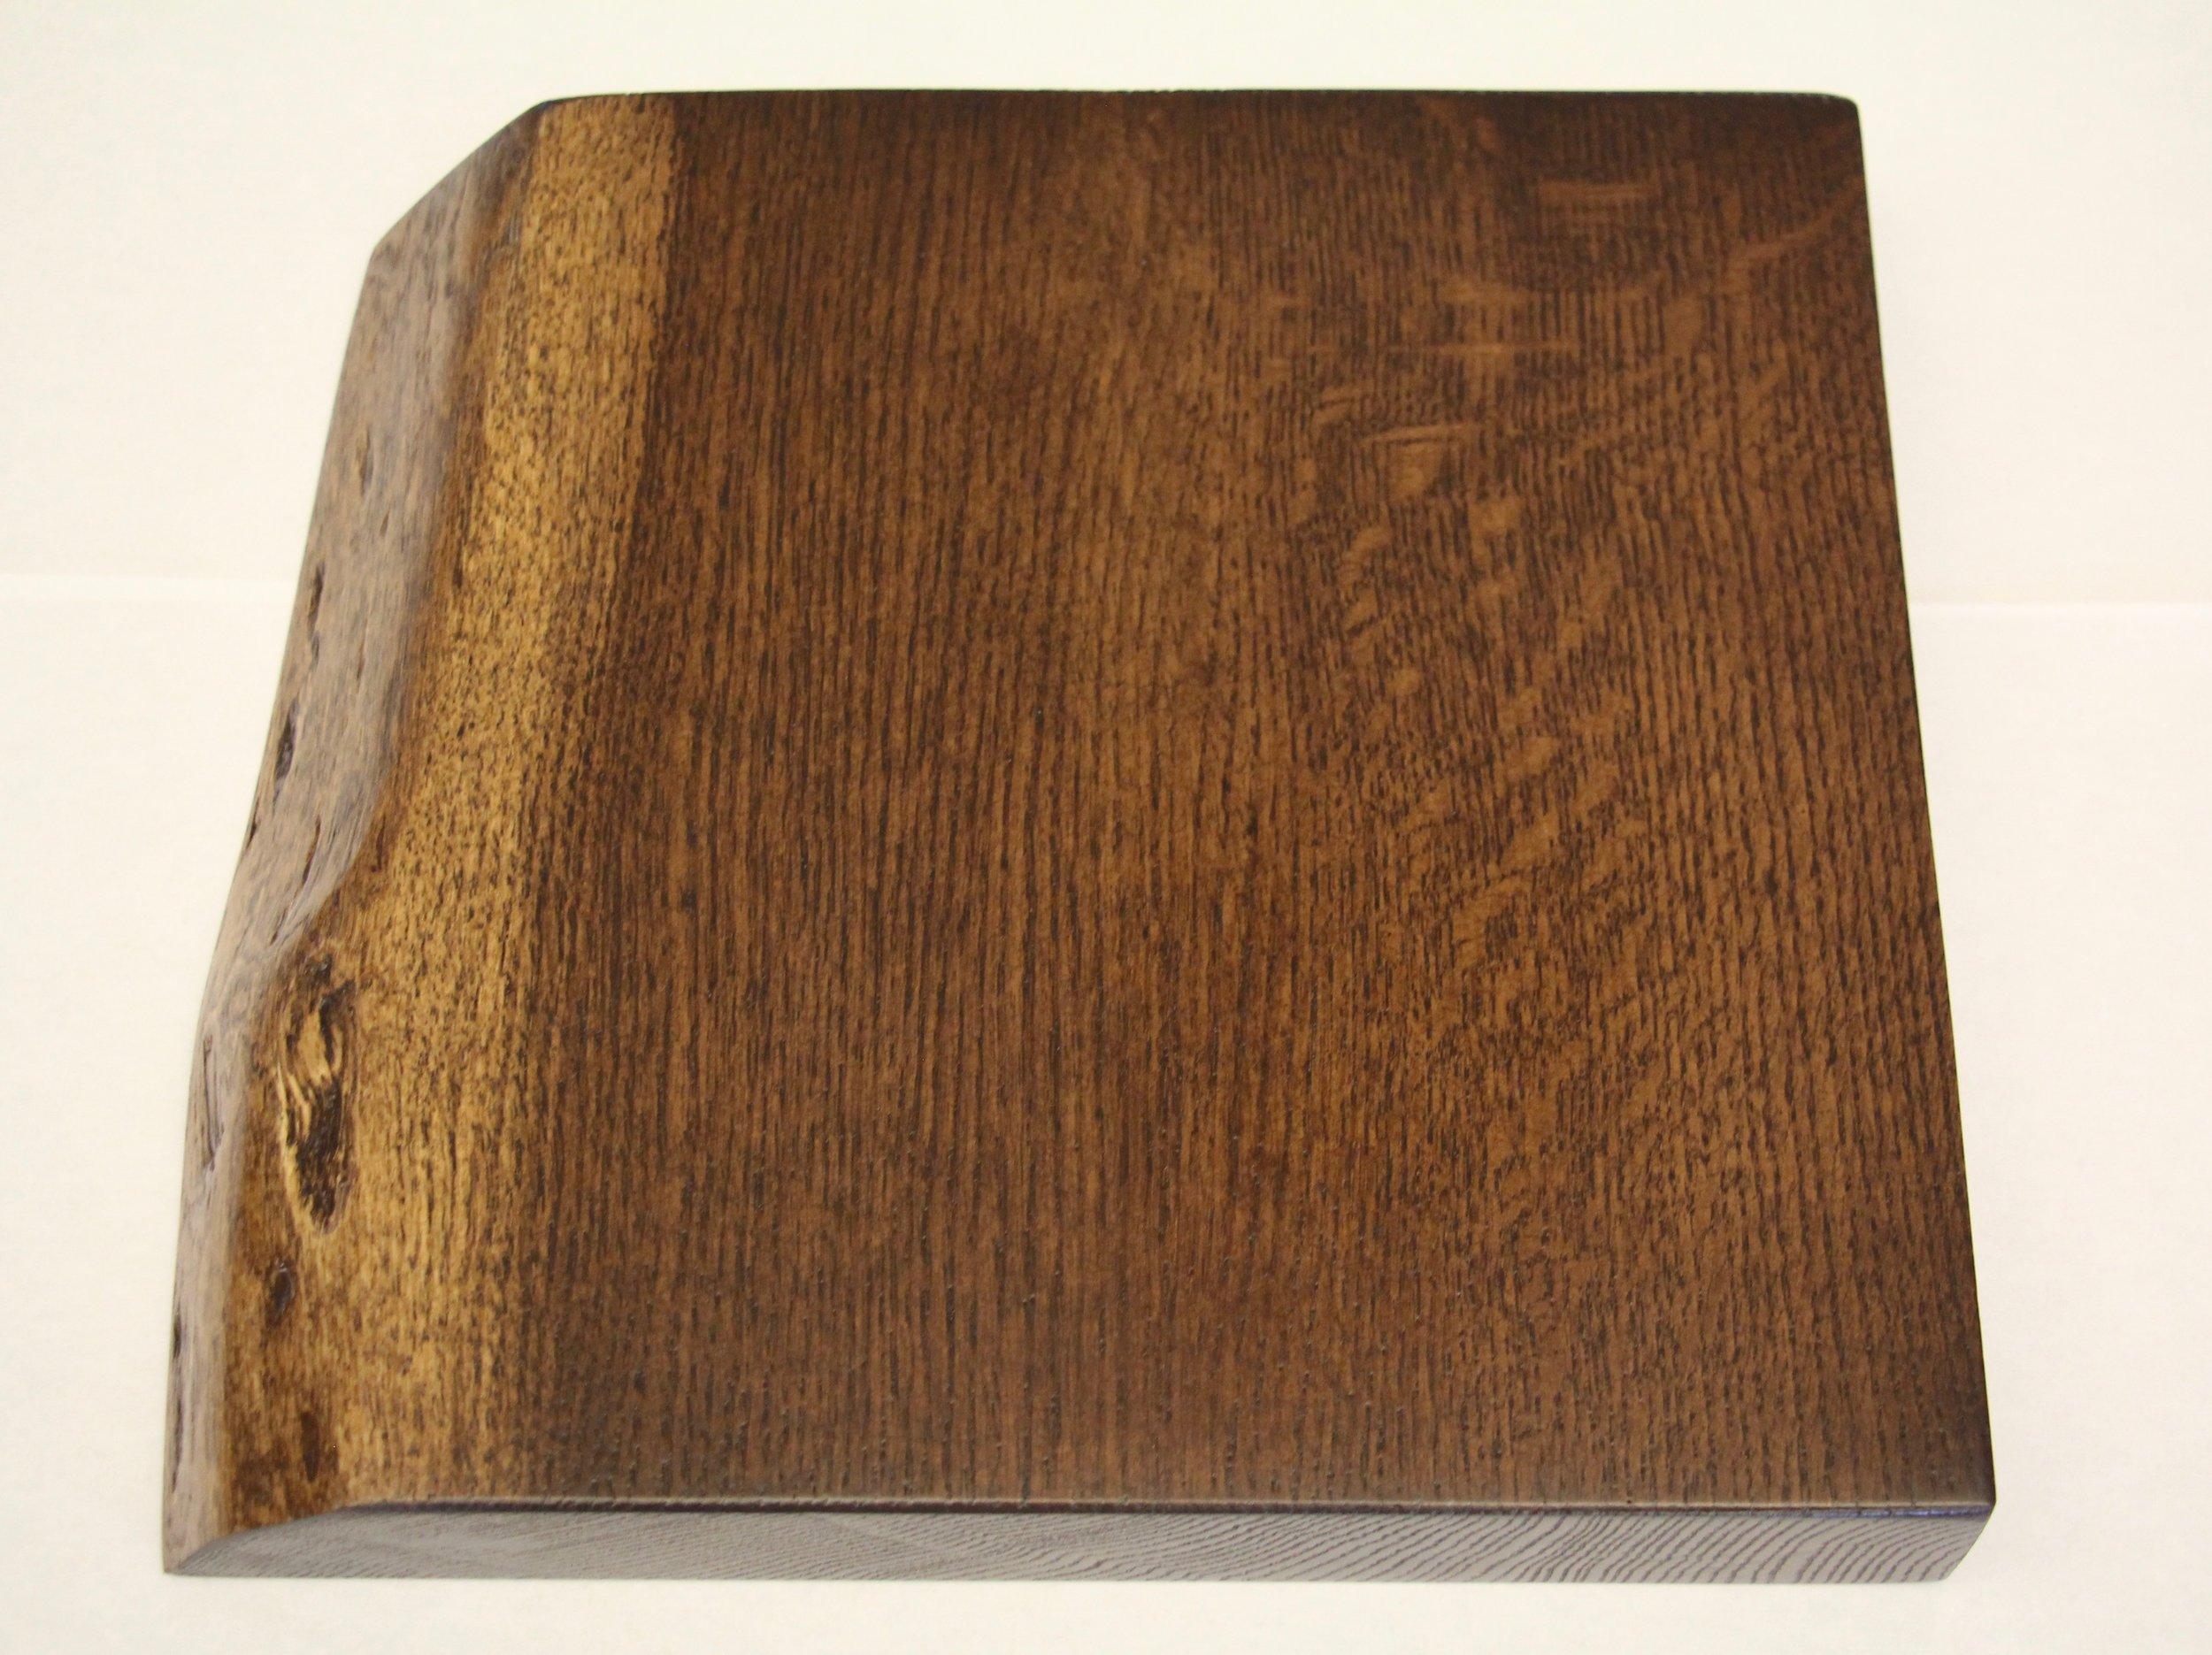 Red oak / live edge / smooth / walnut stain / polyurethane